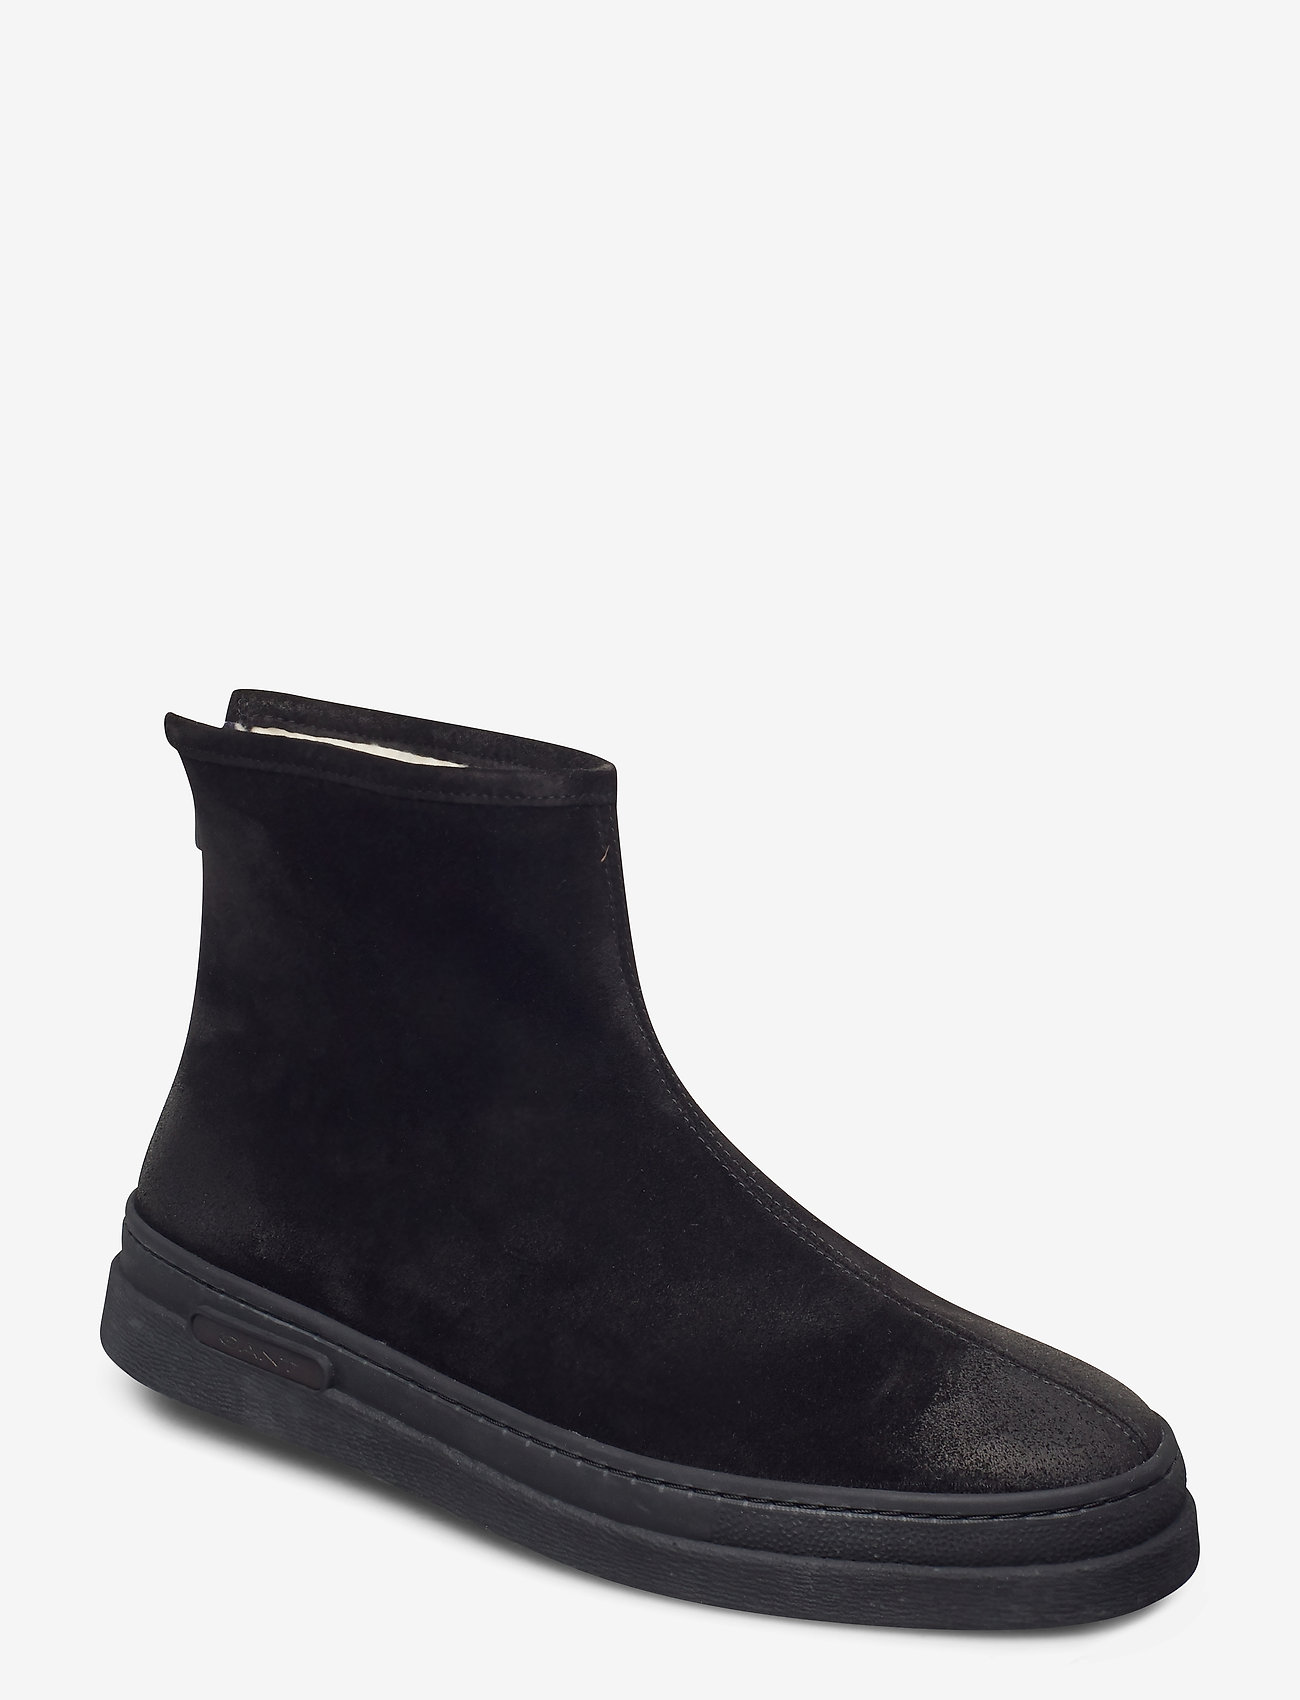 GANT - Cloyd Mid Zip boot - winter boots - black - 0